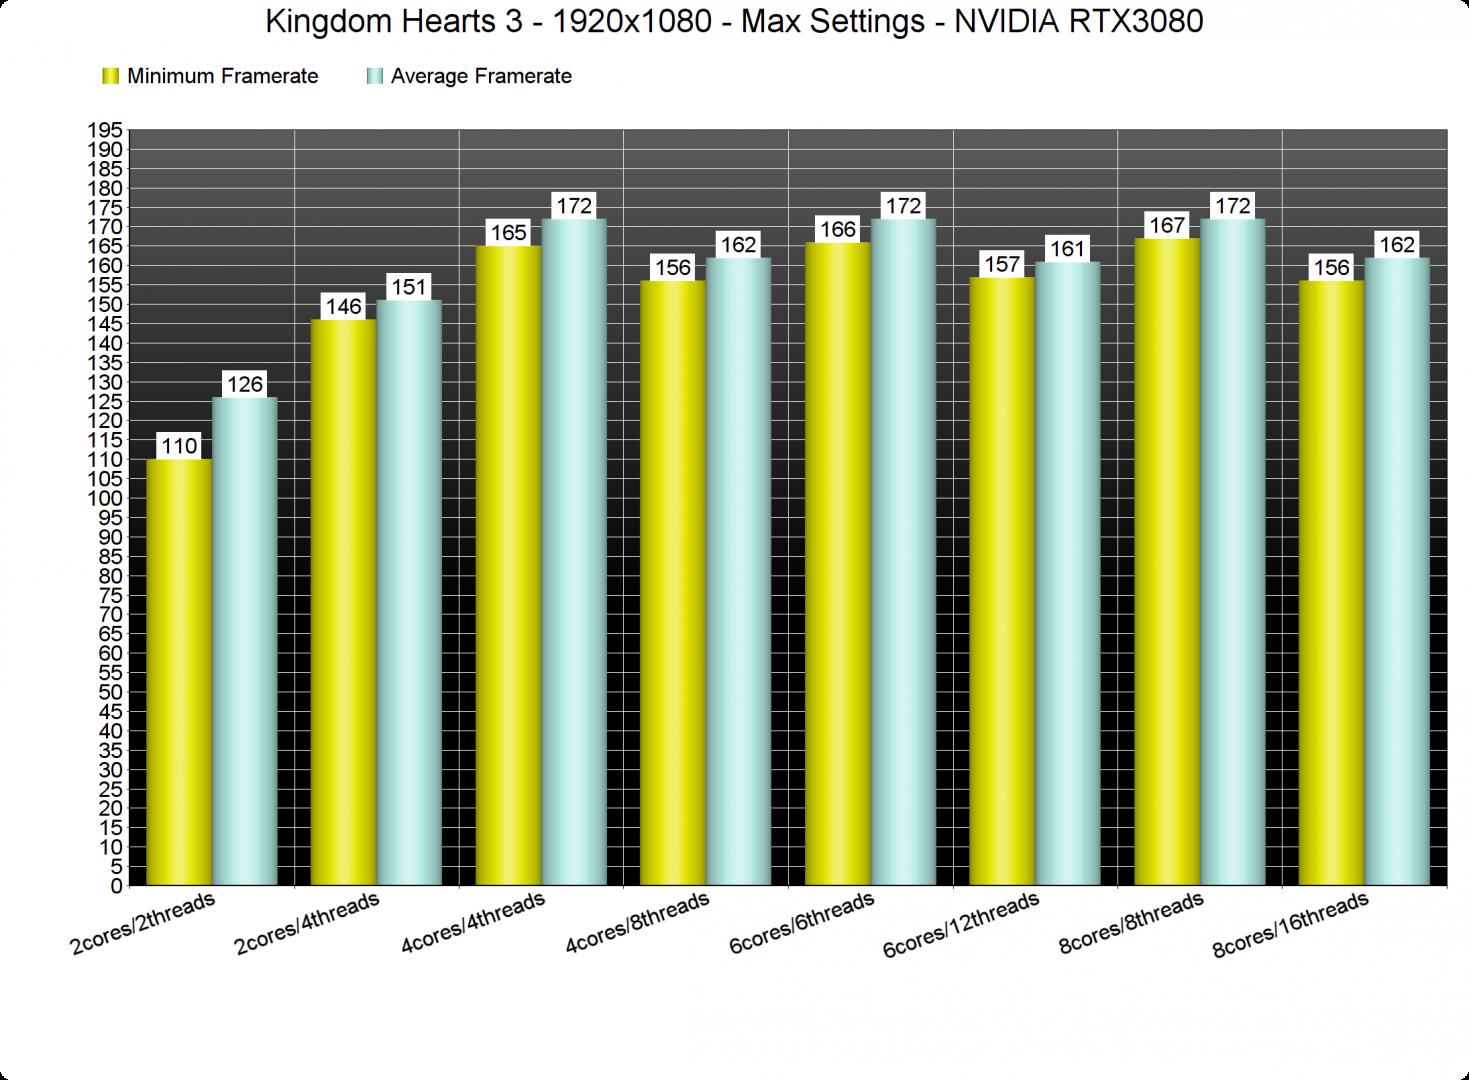 Kingdom Hearts 3 CPU benchmarks